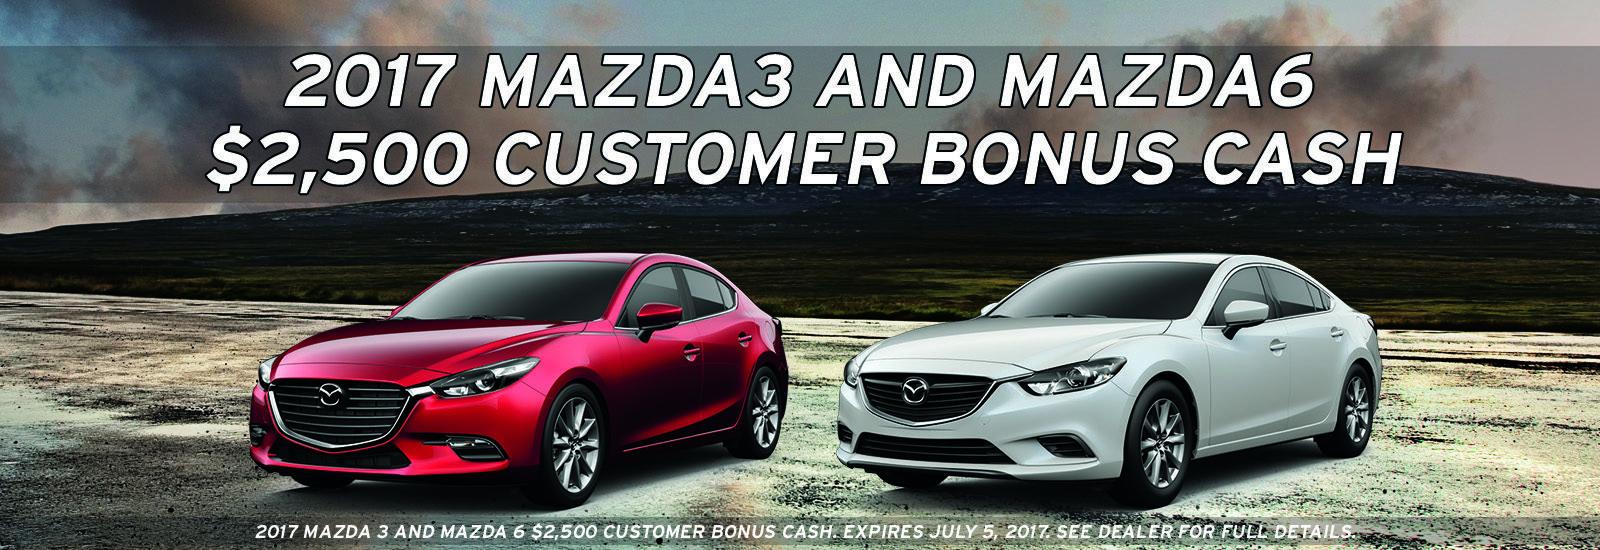 Mazda3 and Mazda6 bonus cash